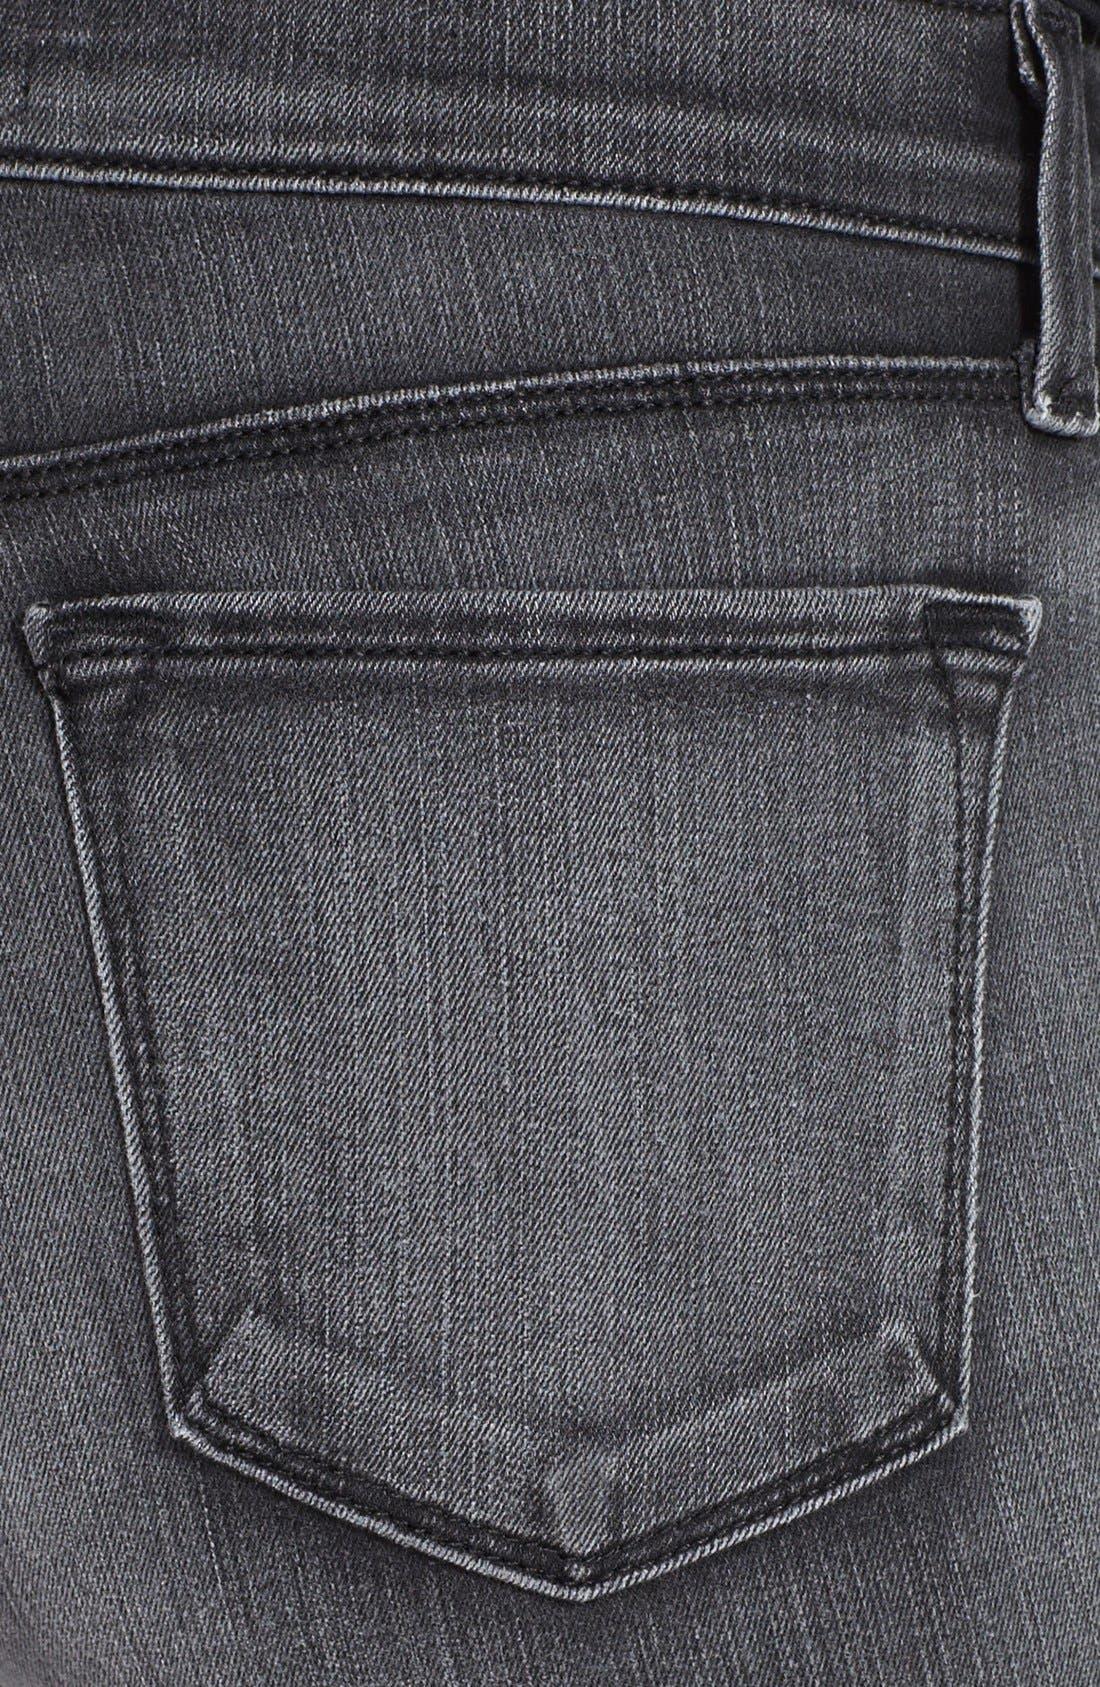 '620' Mid Rise Skinny Jeans,                             Alternate thumbnail 25, color,